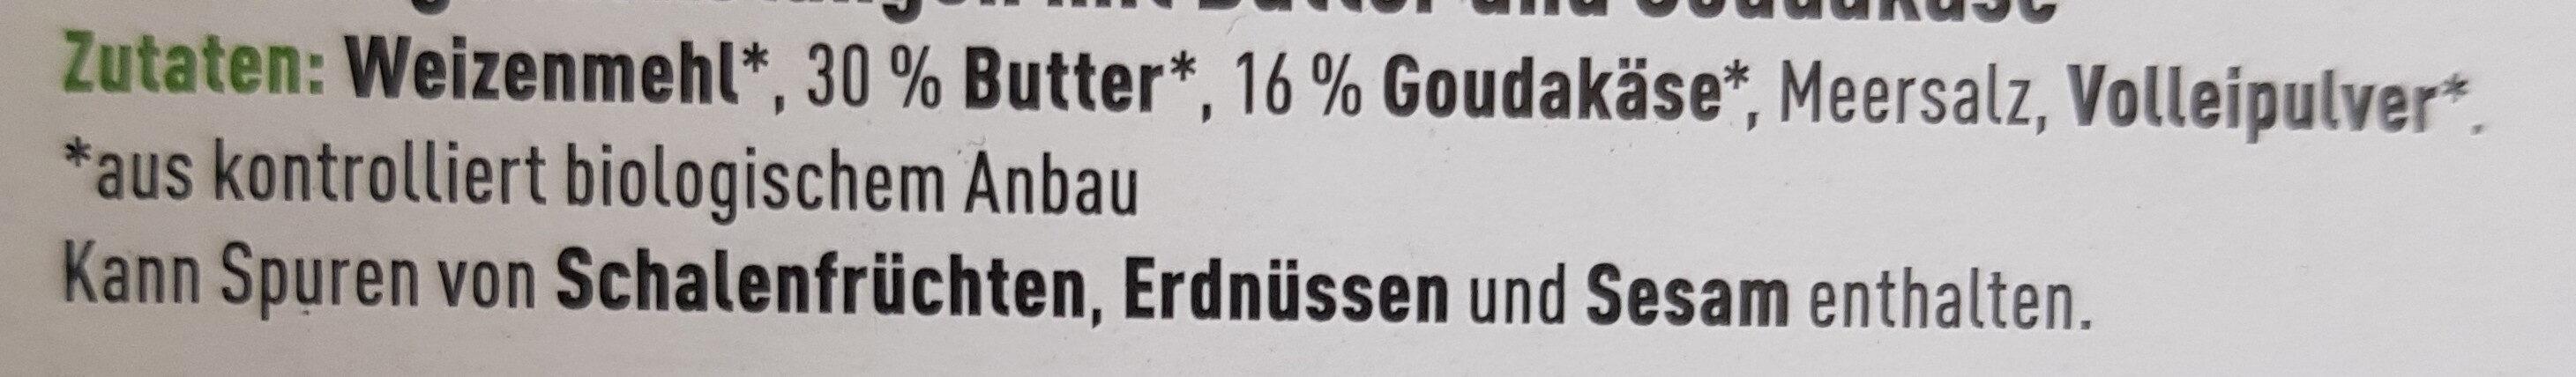 Käse Stangen mit Gouda - Zutaten - de